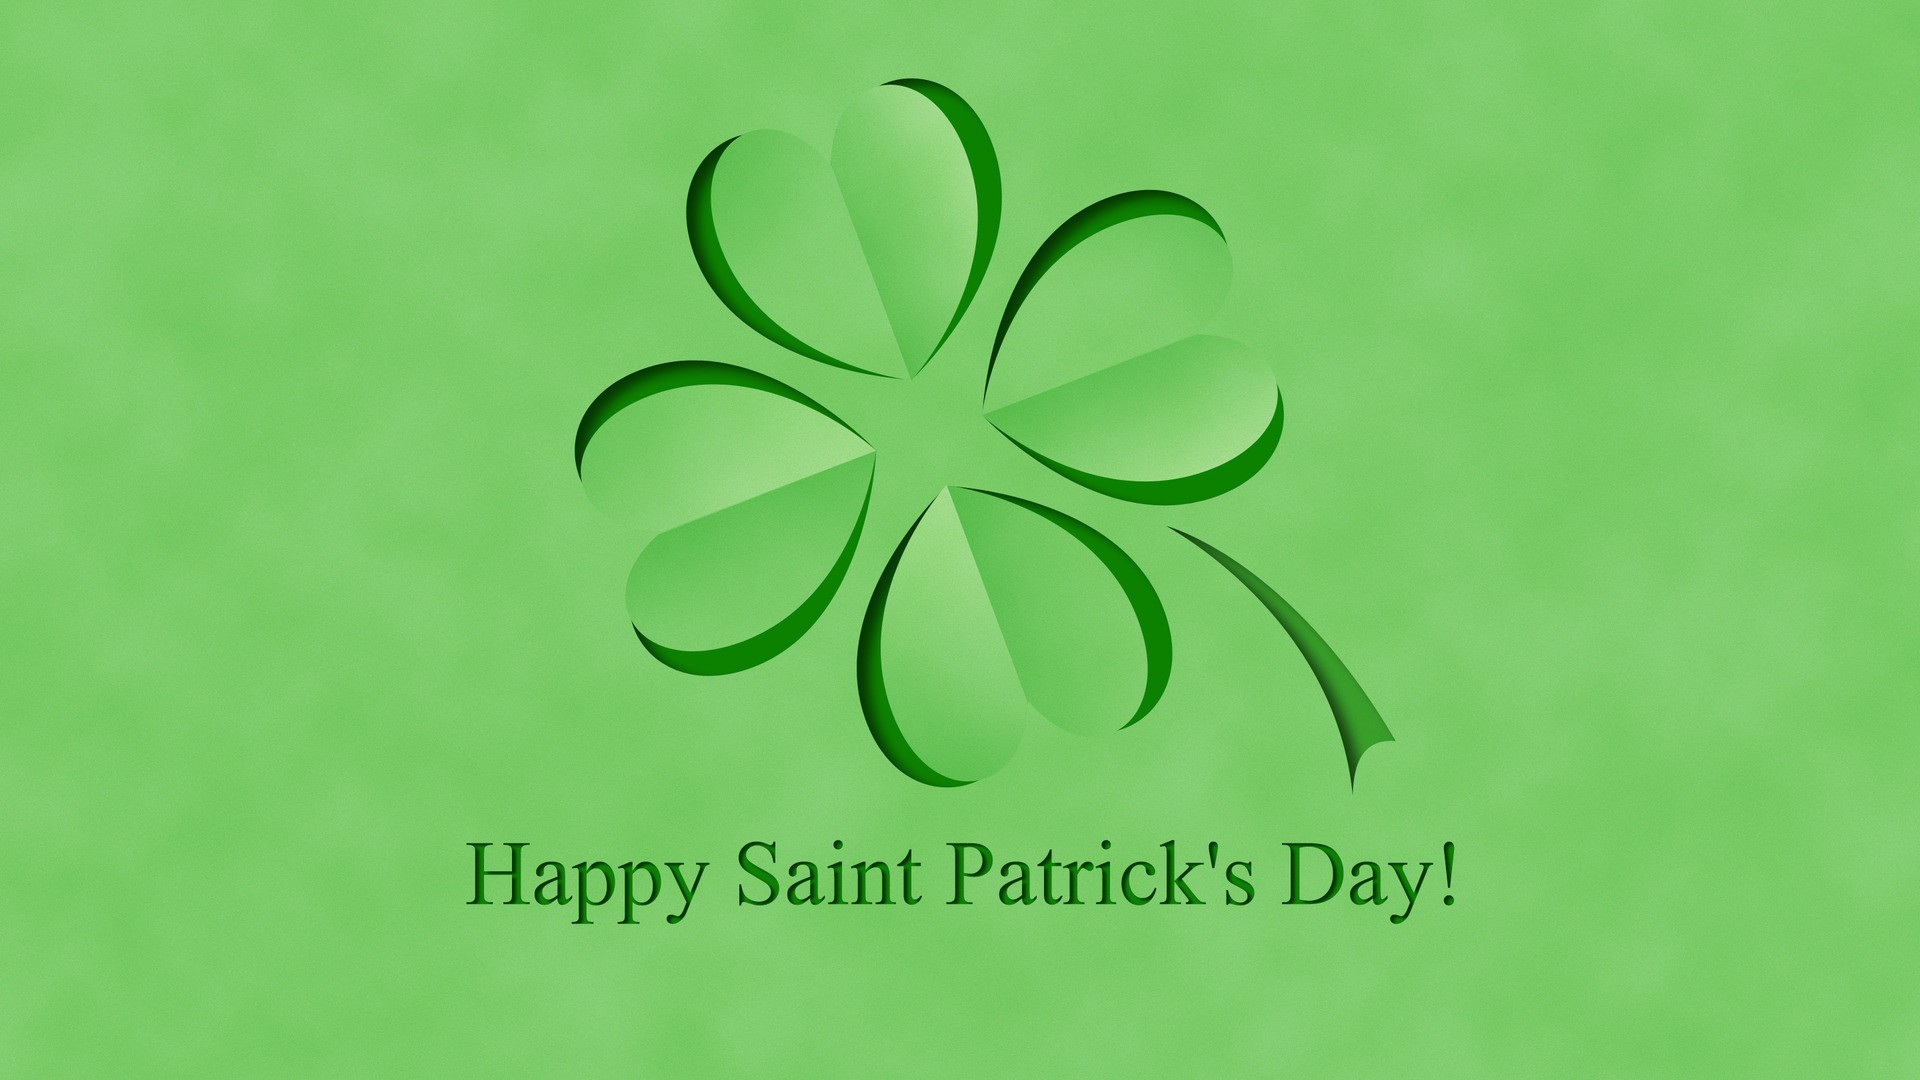 St. Patrick's Day 2021 wallpaper photo hd